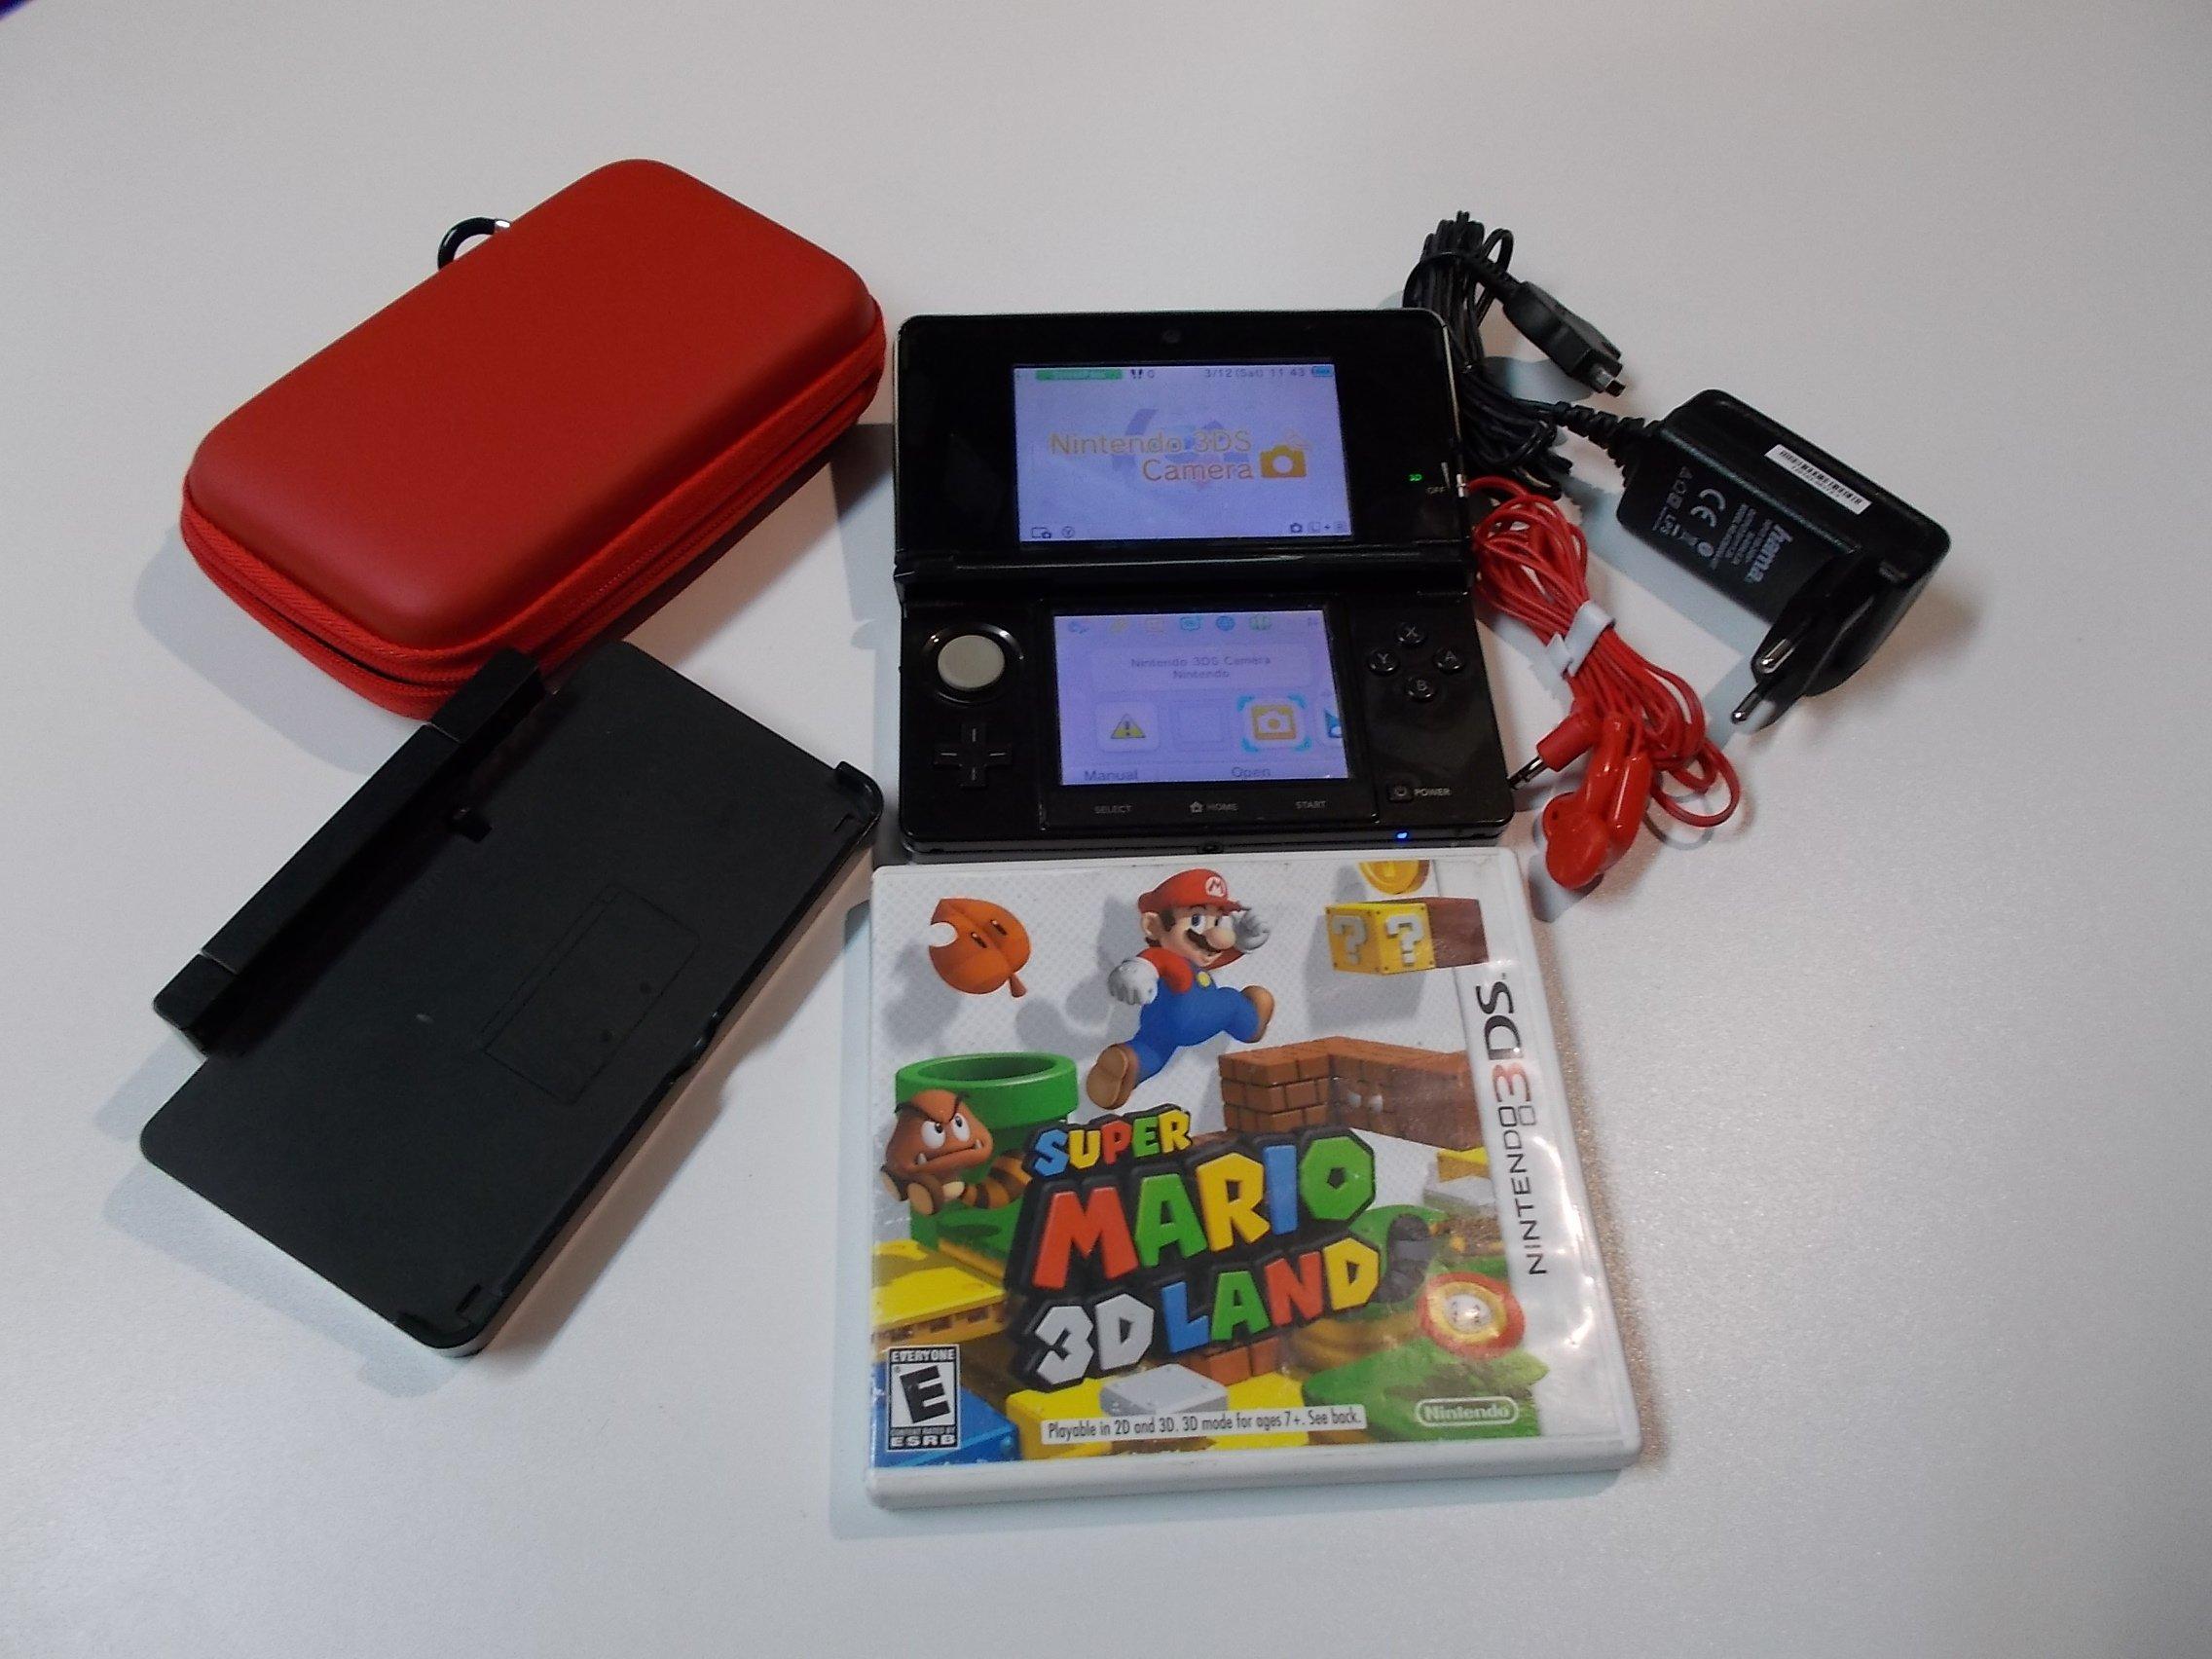 Konsola Nintendo 3DS + Gra Super Mario 3d Land wersja NTSC konsola i gra z USA - Sklep